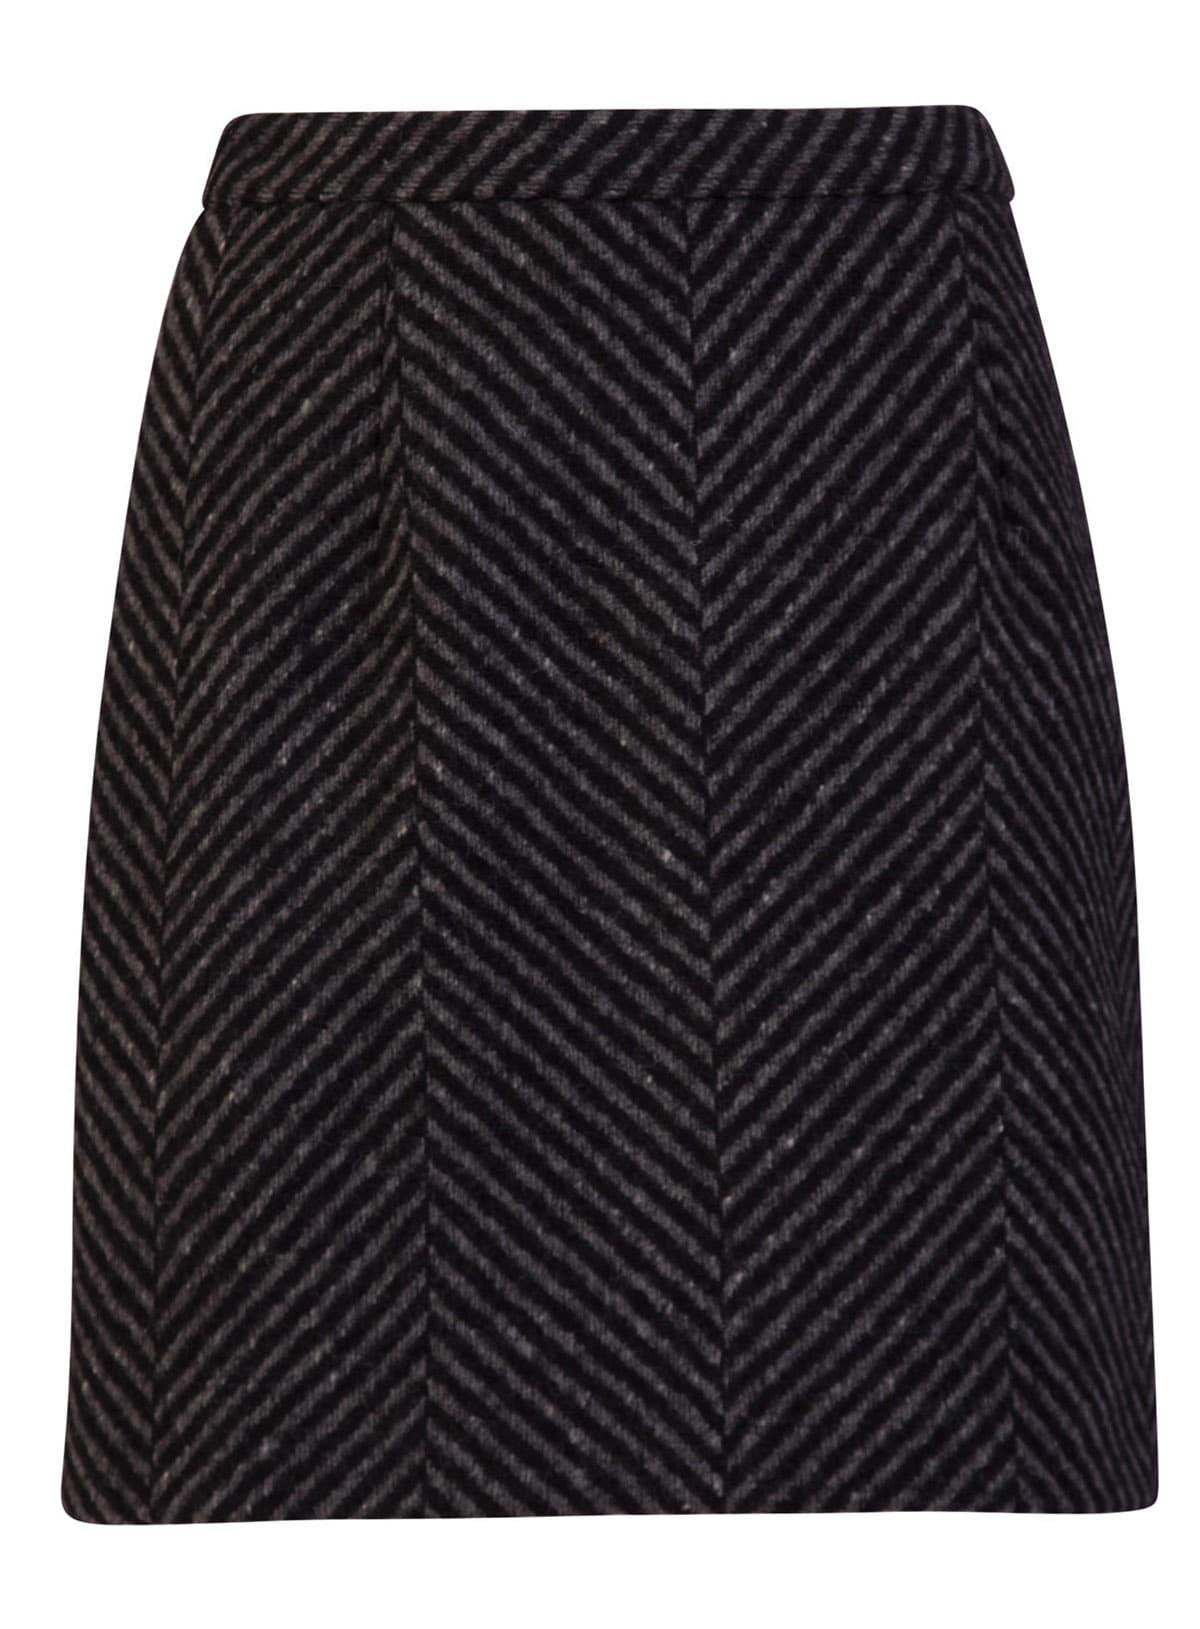 Off-white Chevron Tailored Mini Skirt